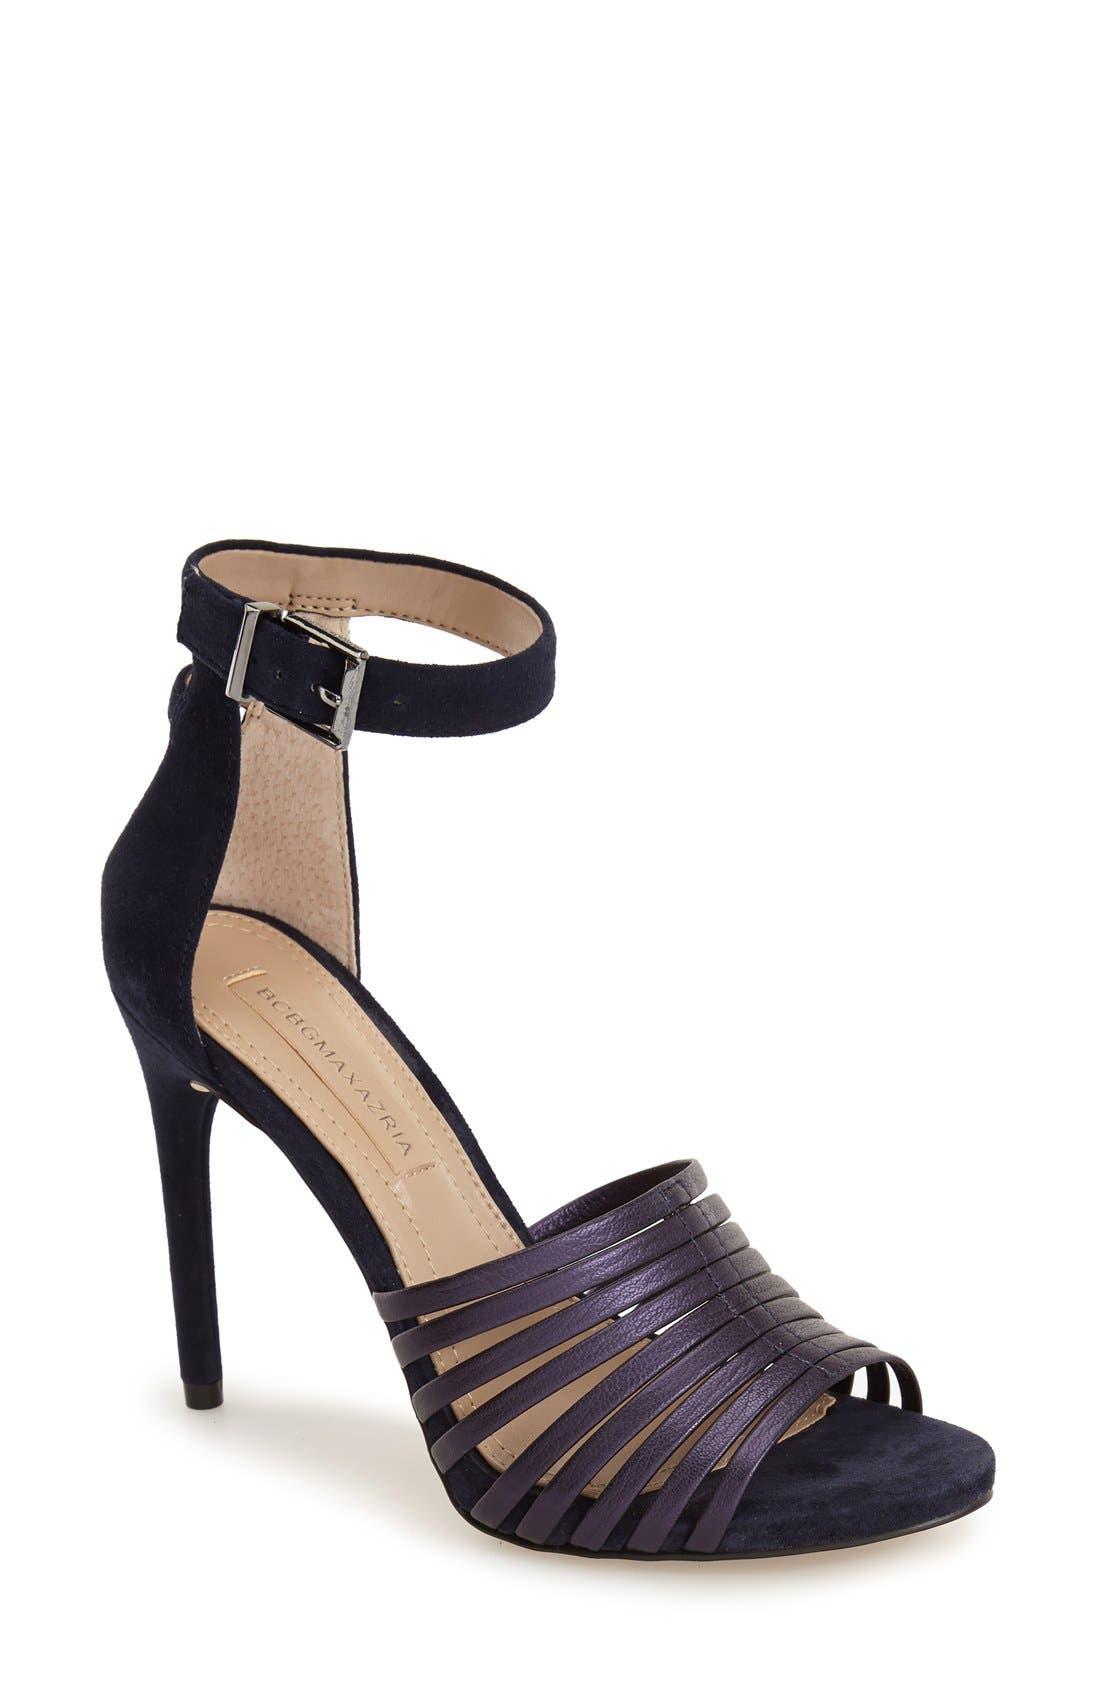 Alternate Image 1 Selected - BCBCMAXAZRIA 'Dena' Strappy Sandal (Women)